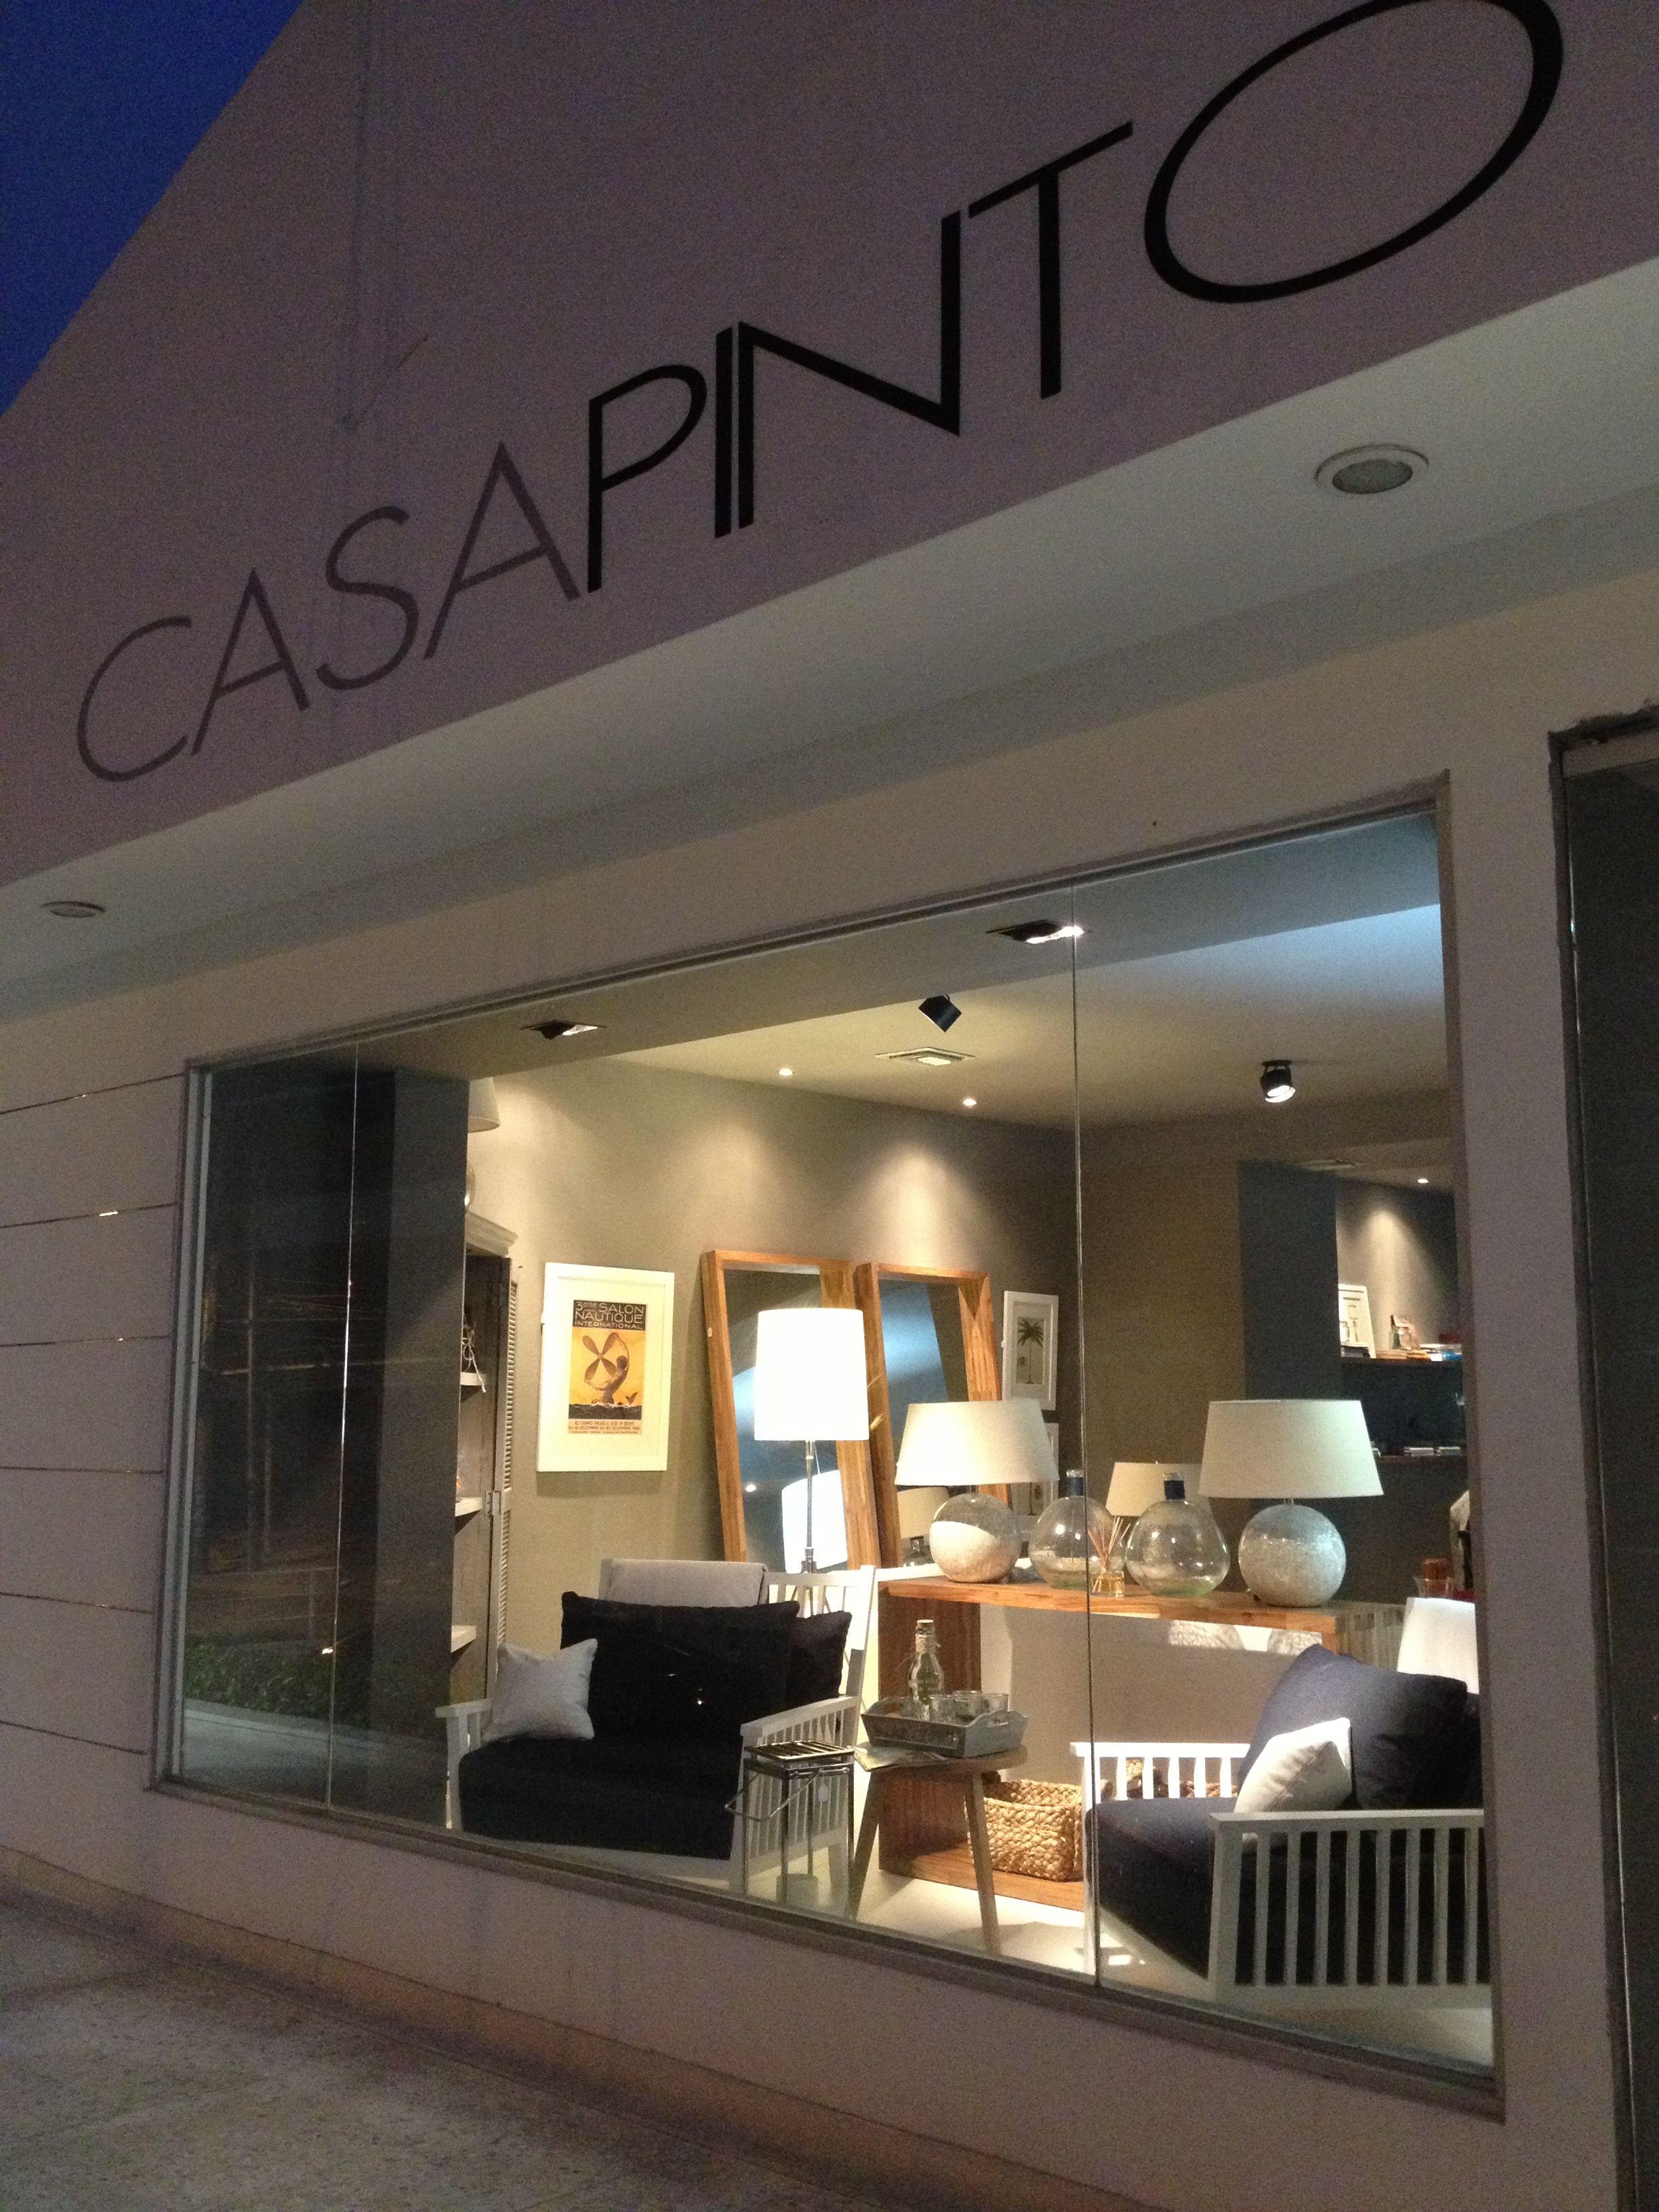 Casapinto Dise O Interior Kra 51b 80 99 Barranquilla Colombia  # Muebles Relax Barranquilla